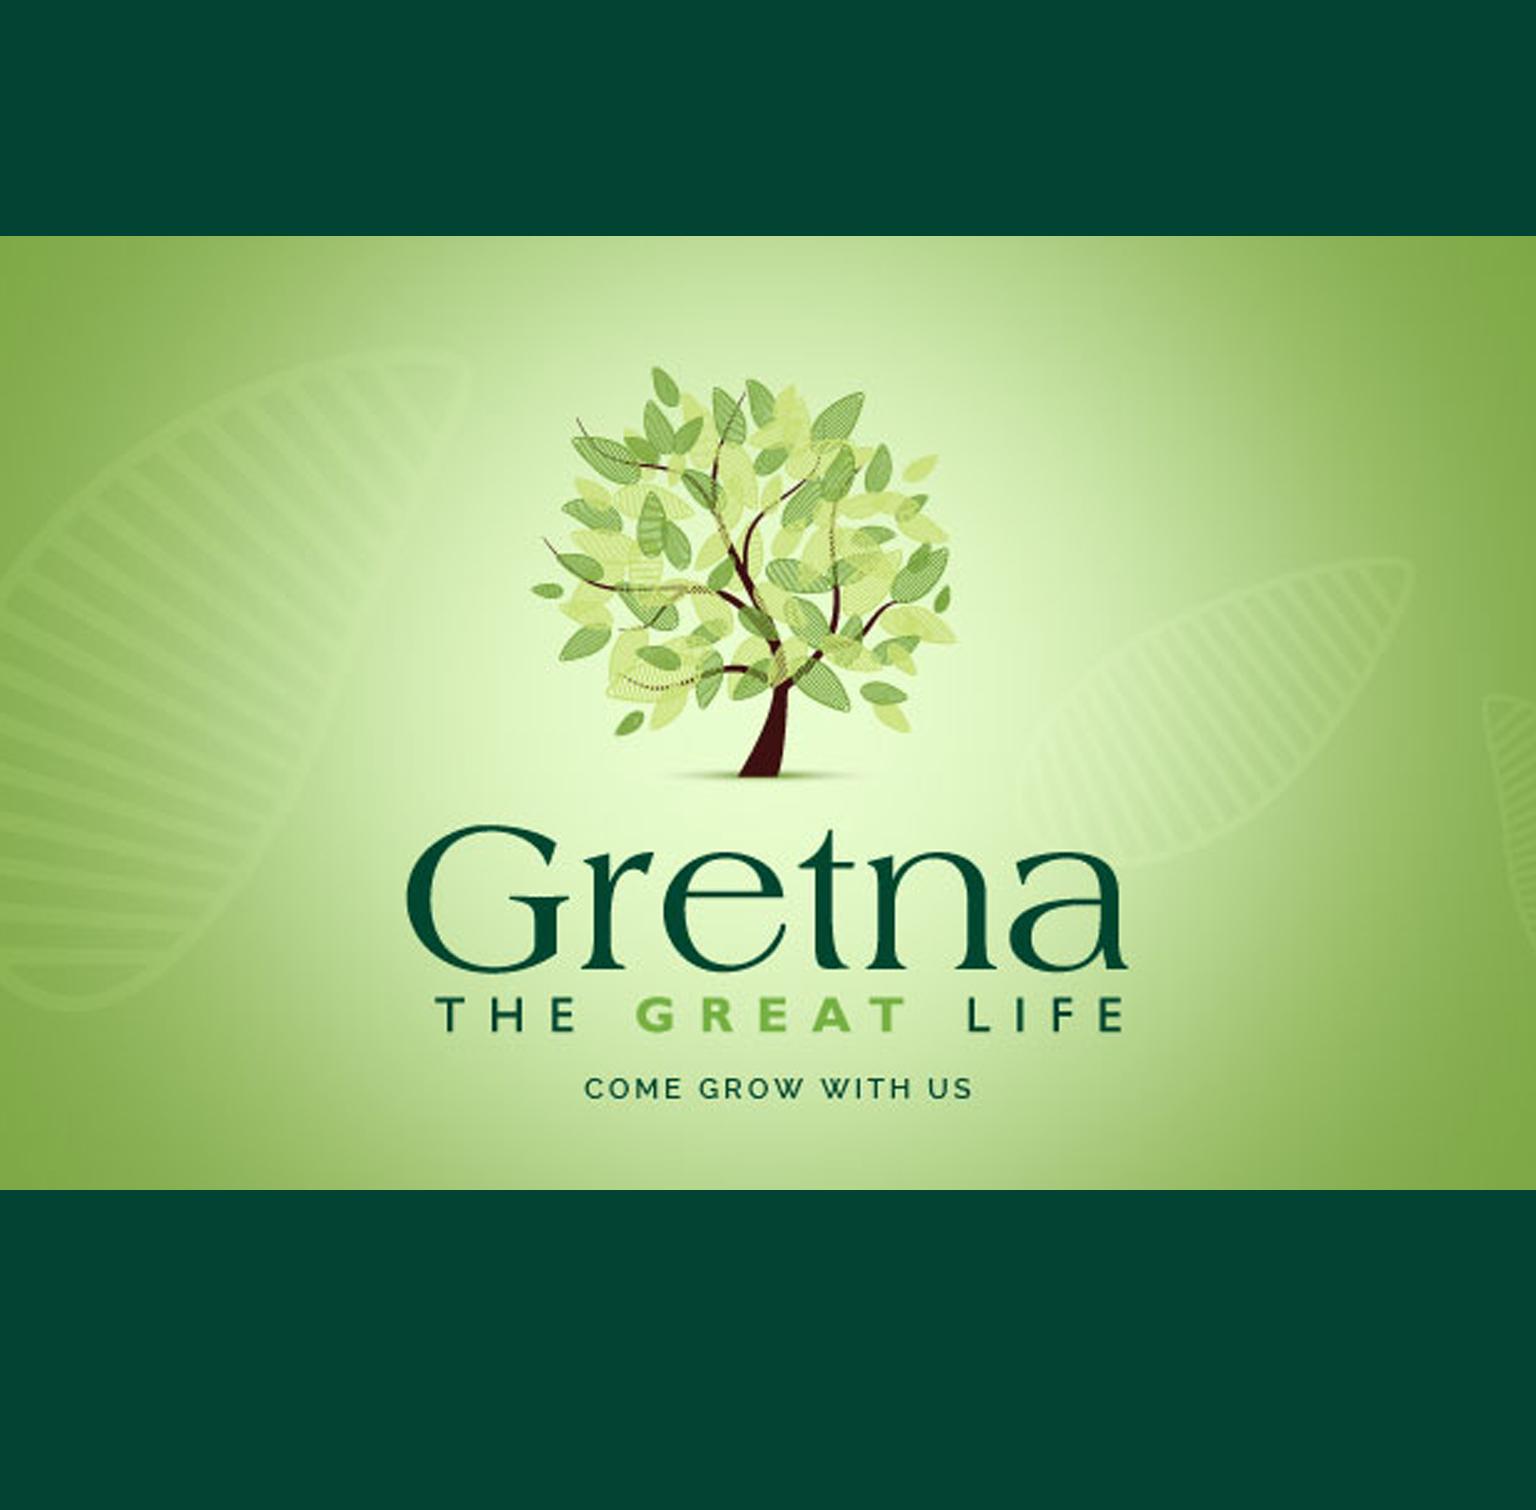 Gretna City Council Meeting